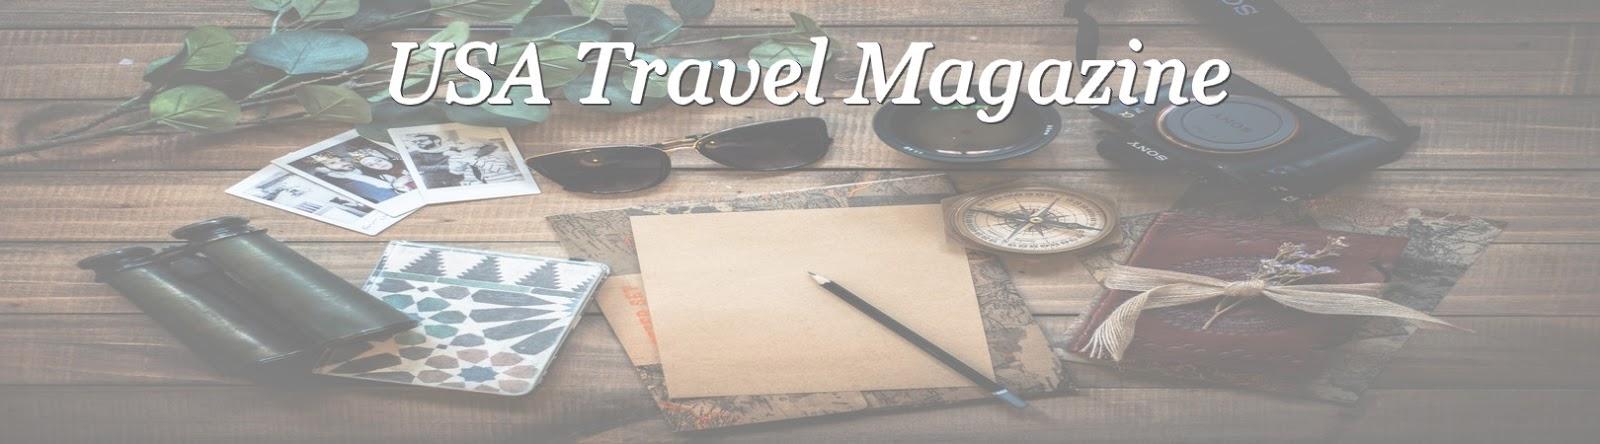 Explore America's Backyard and Beyond with USA Travel Magazine!